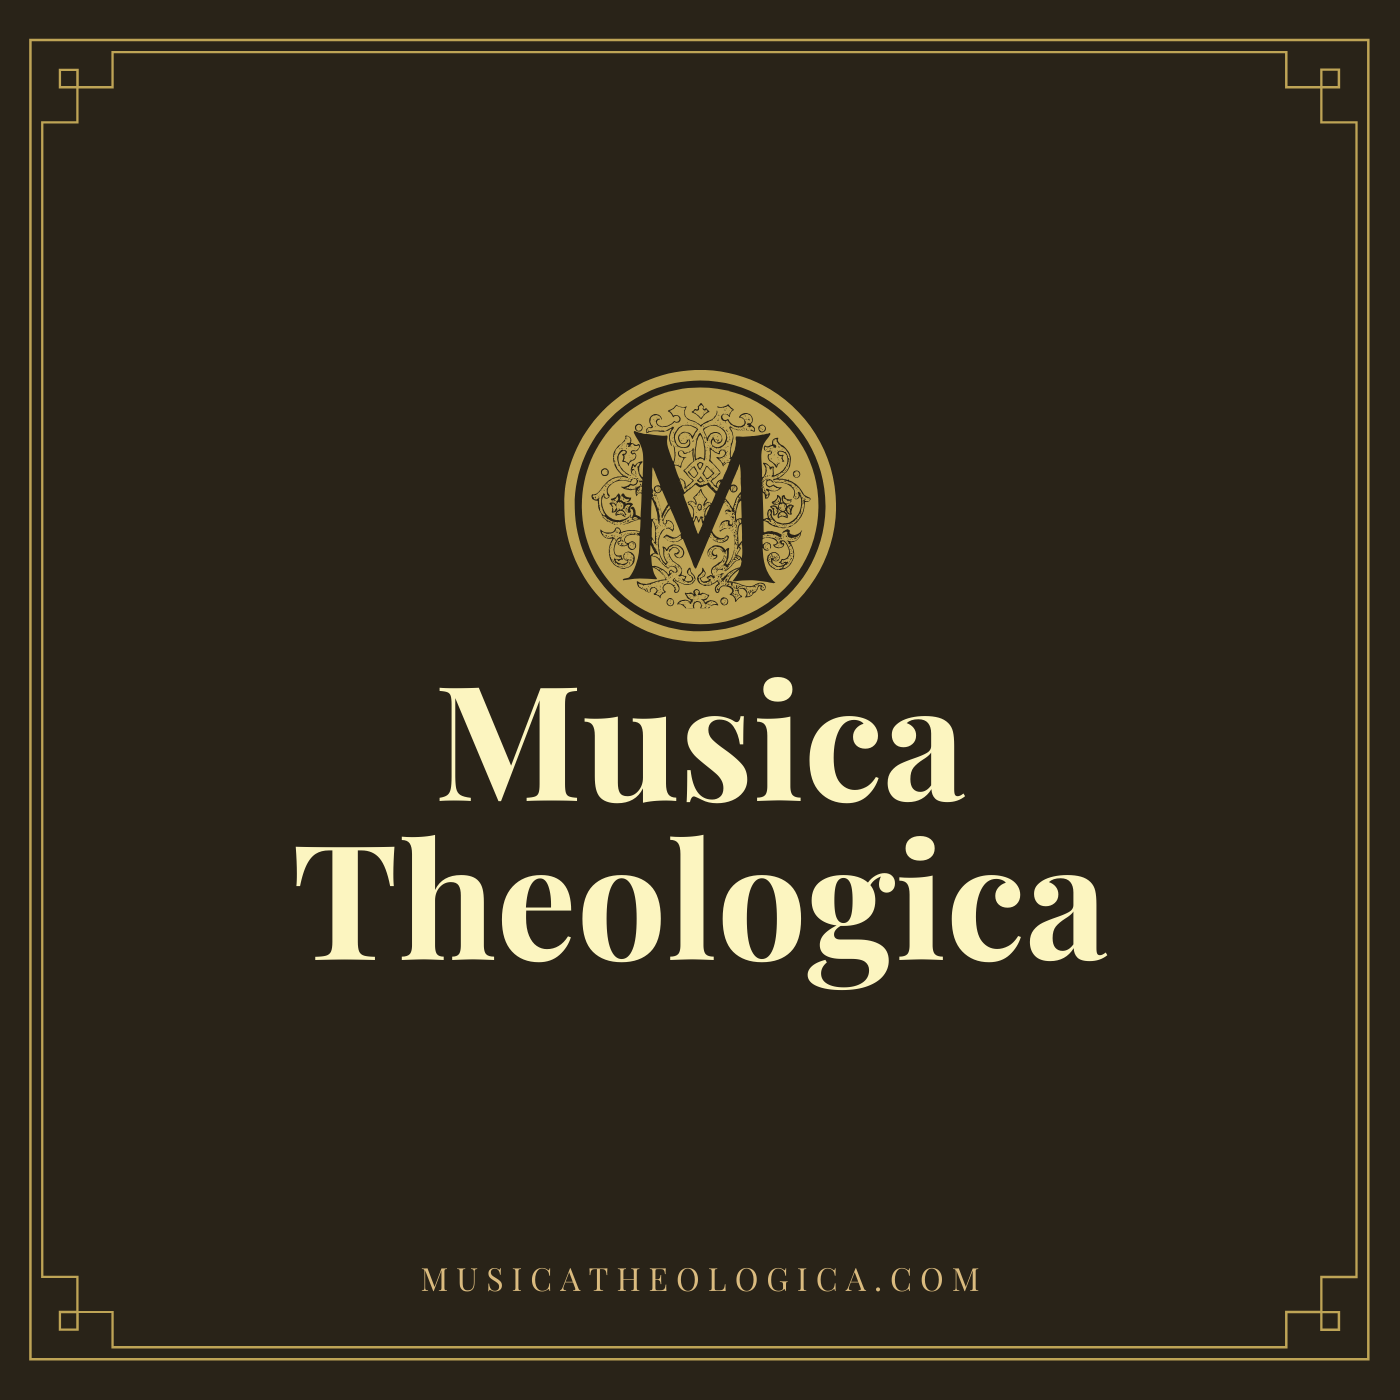 Musica Theologica